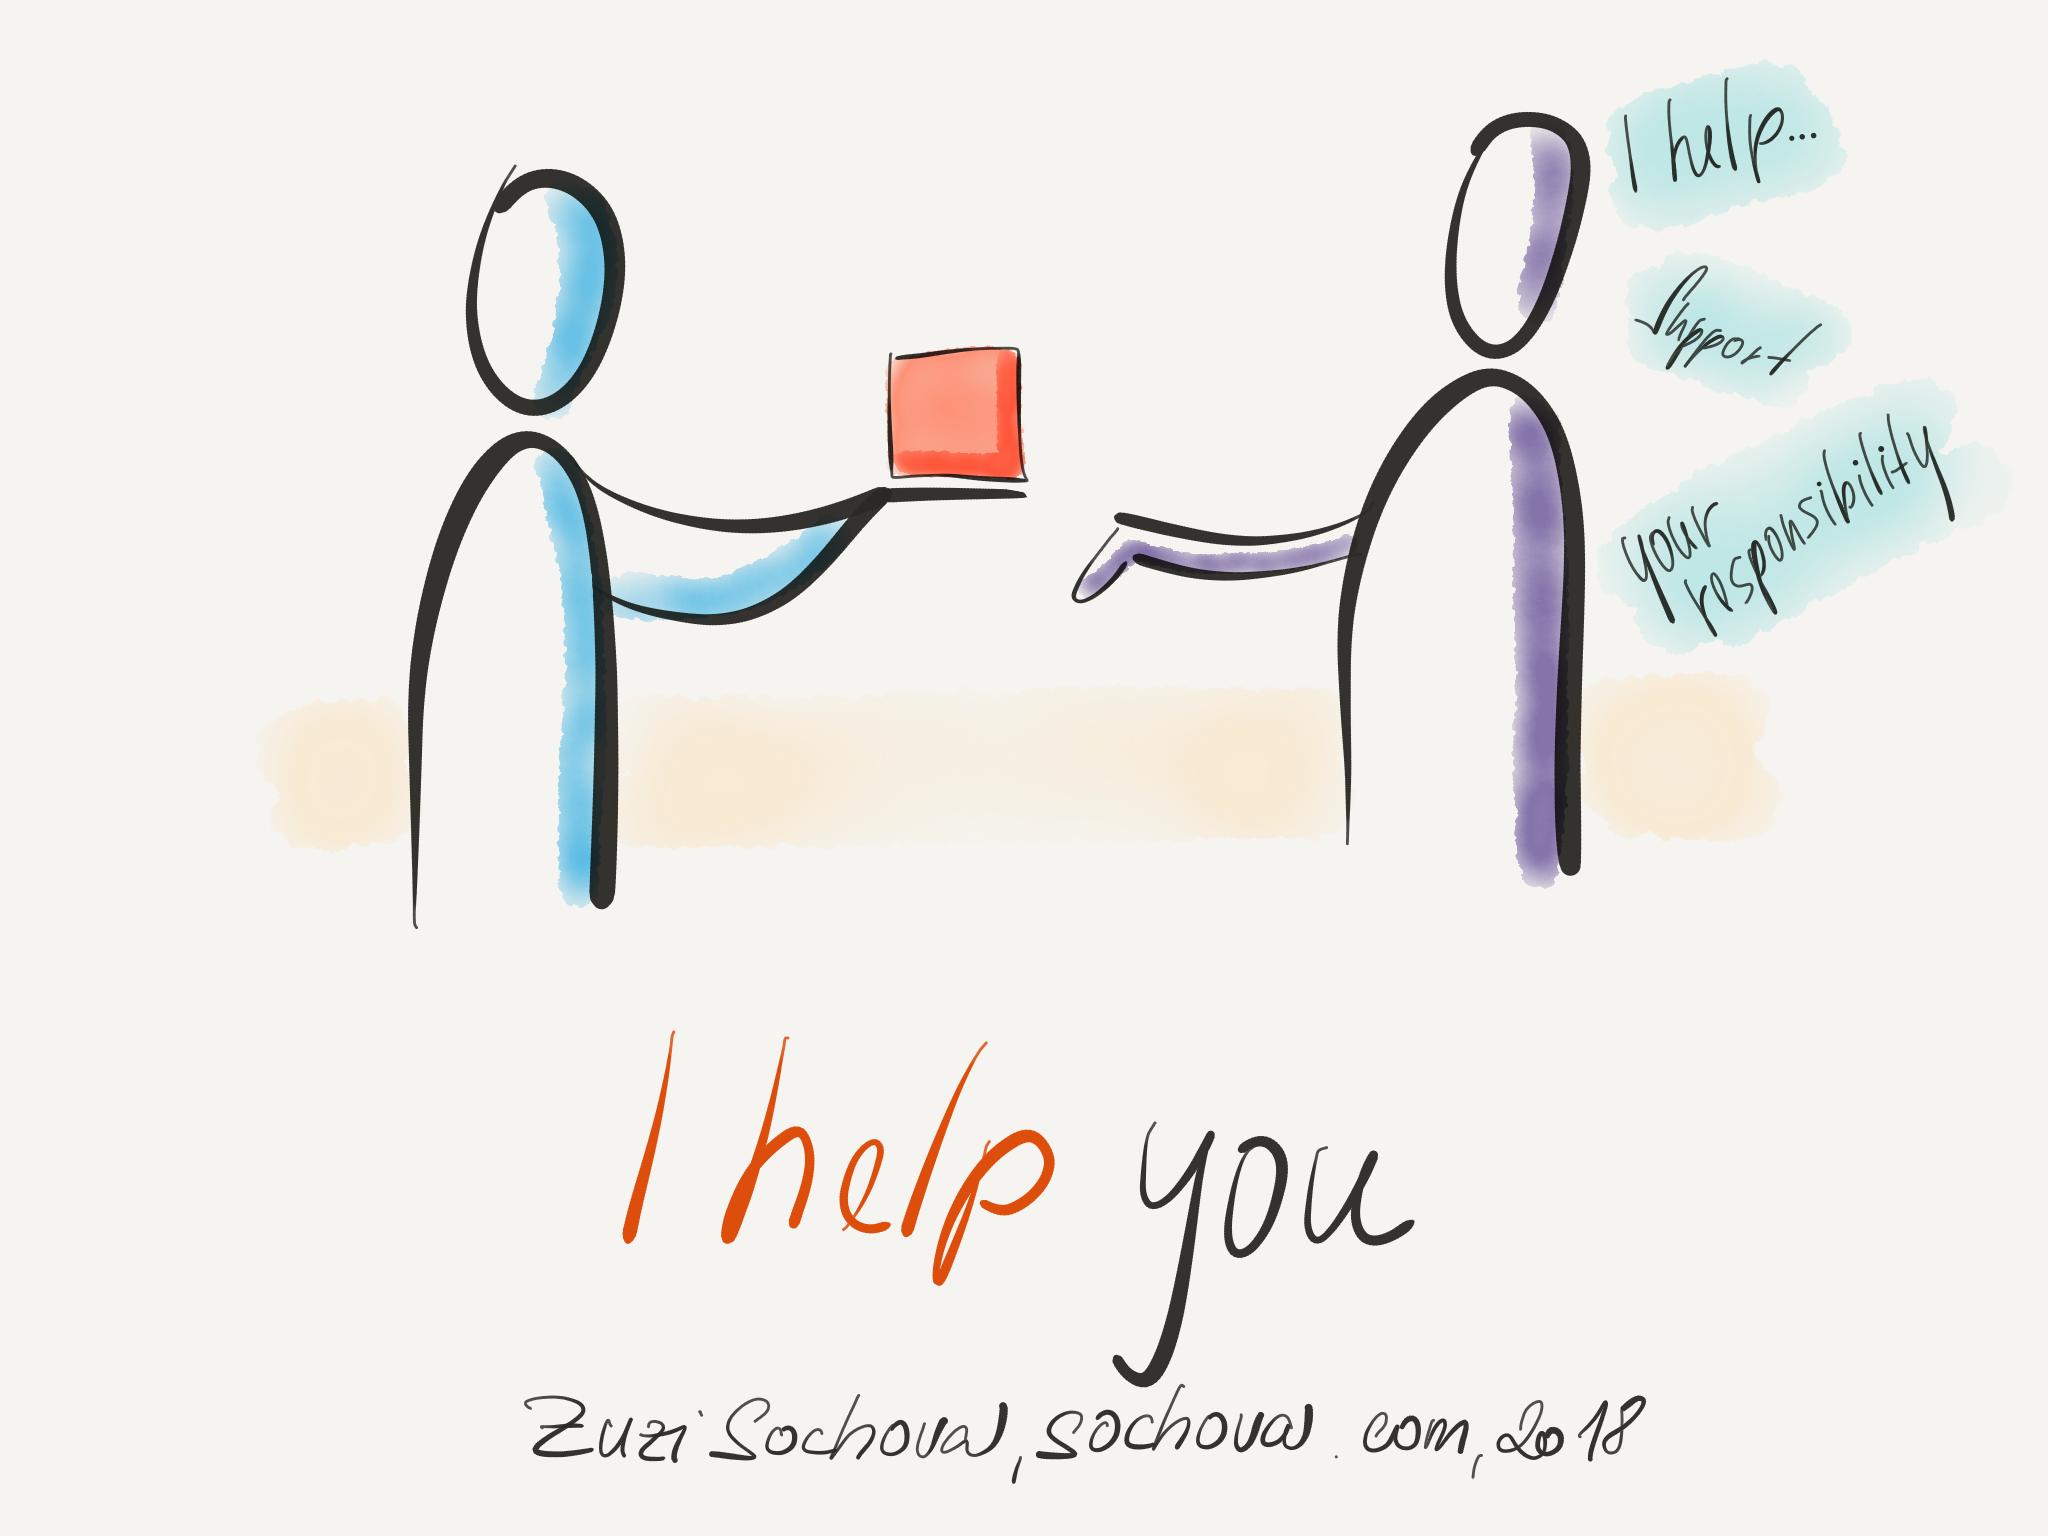 Scrum – Agile and Scrum Blog